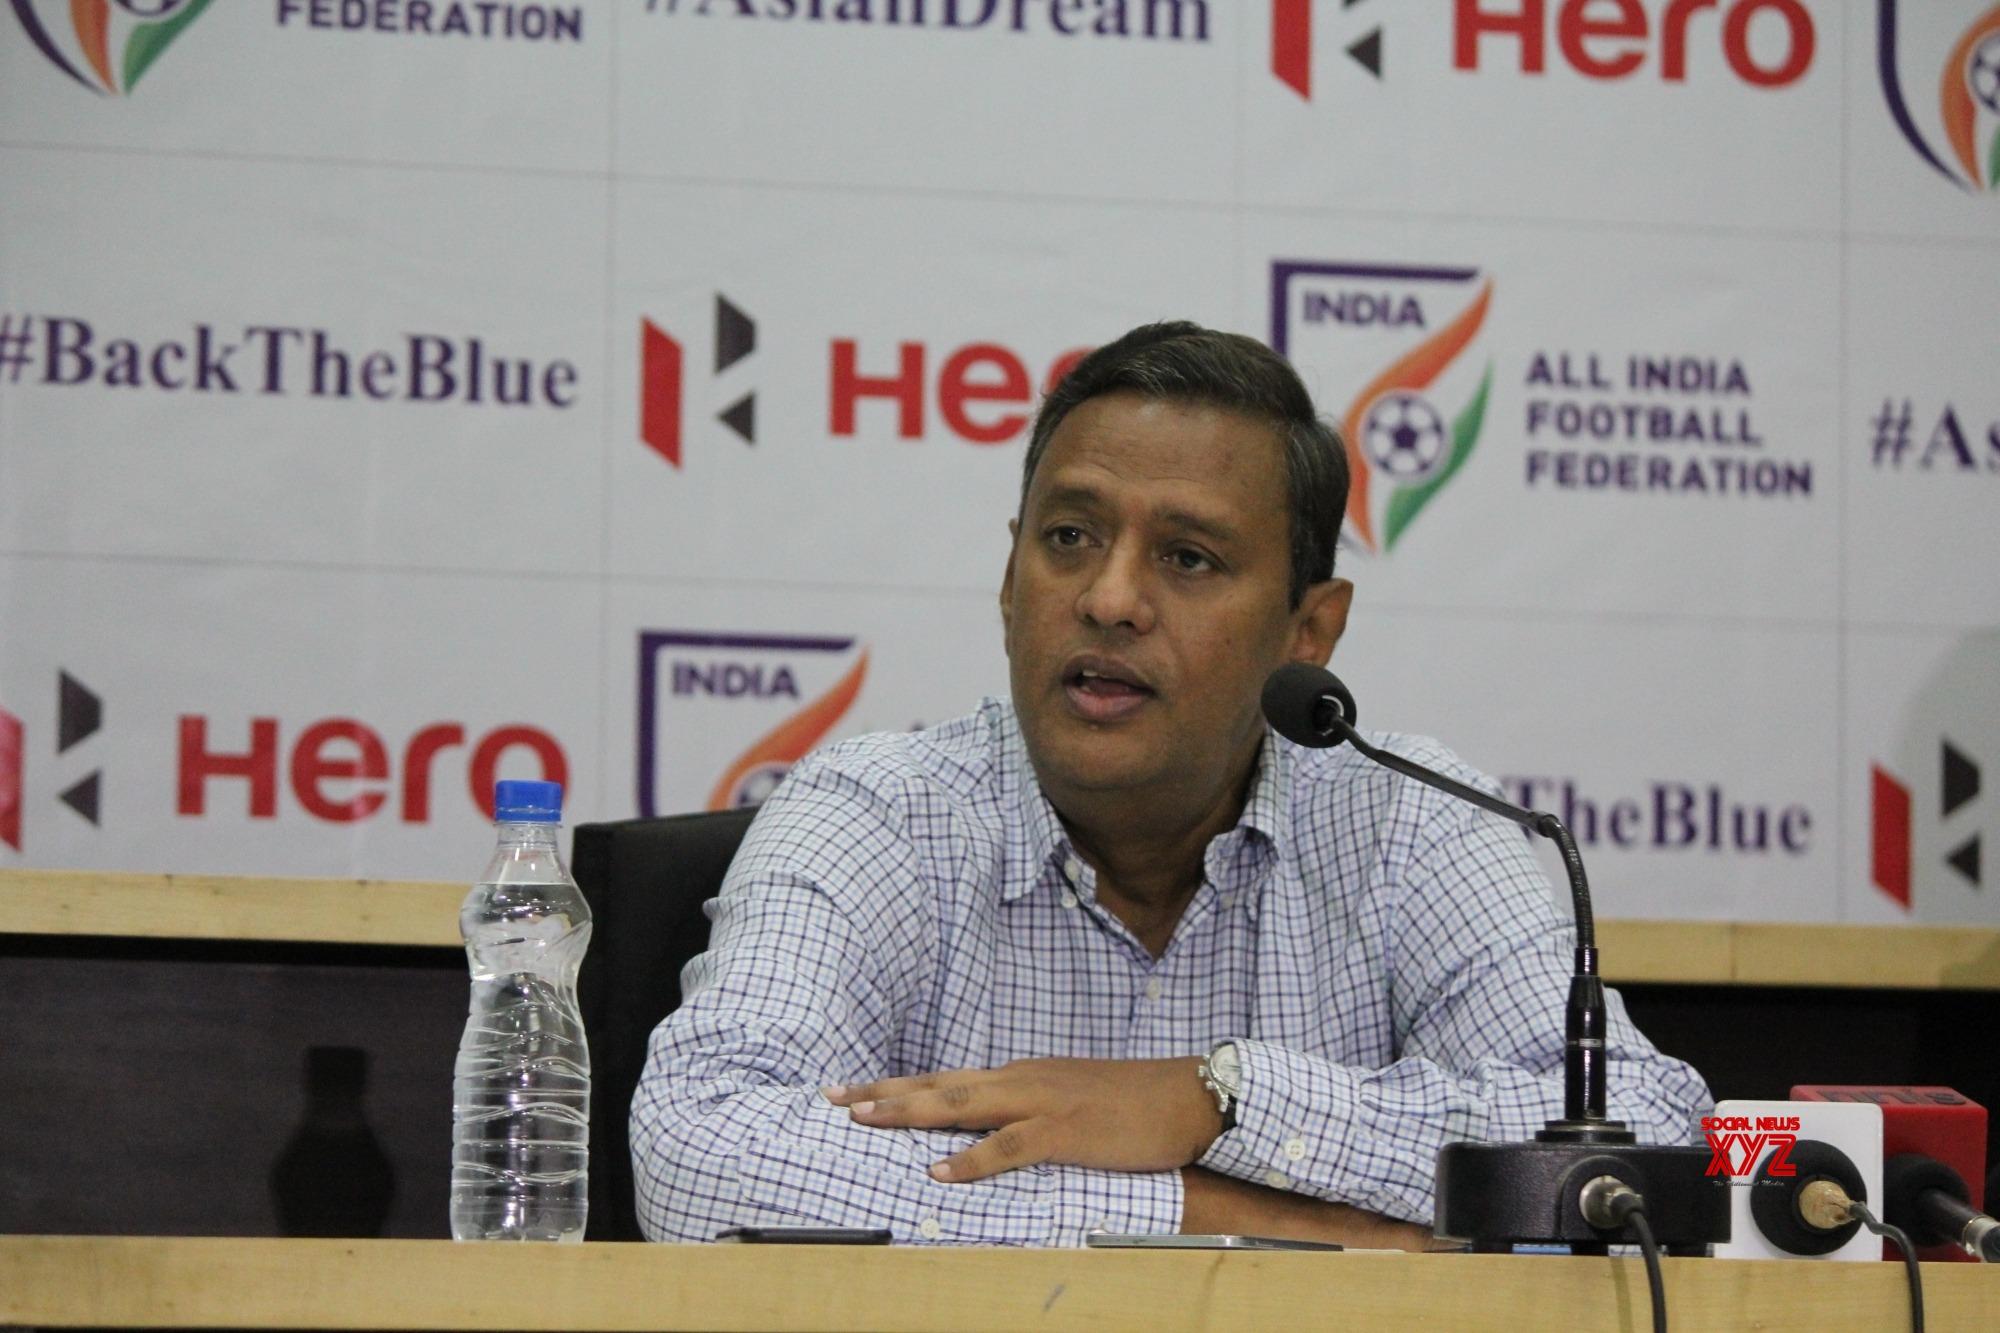 Can Indian football afford Domenech or Eriksson: Das